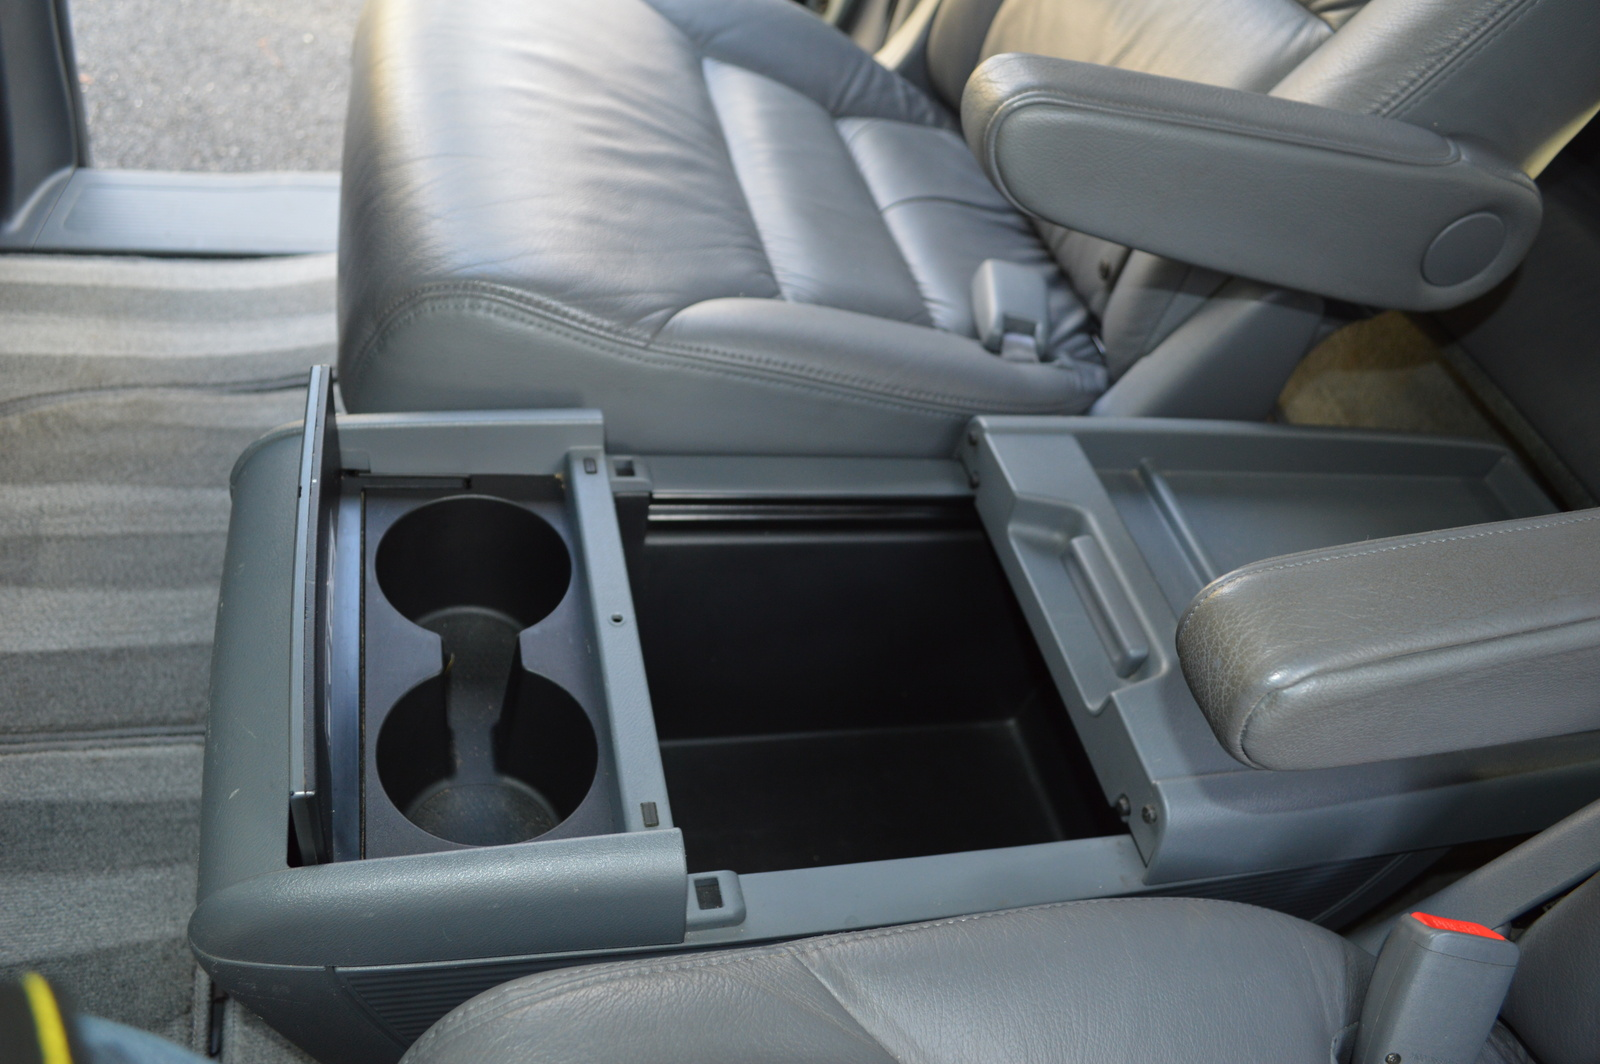 2007 Honda Accord Lx >> 2005 Honda Odyssey - Pictures - CarGurus